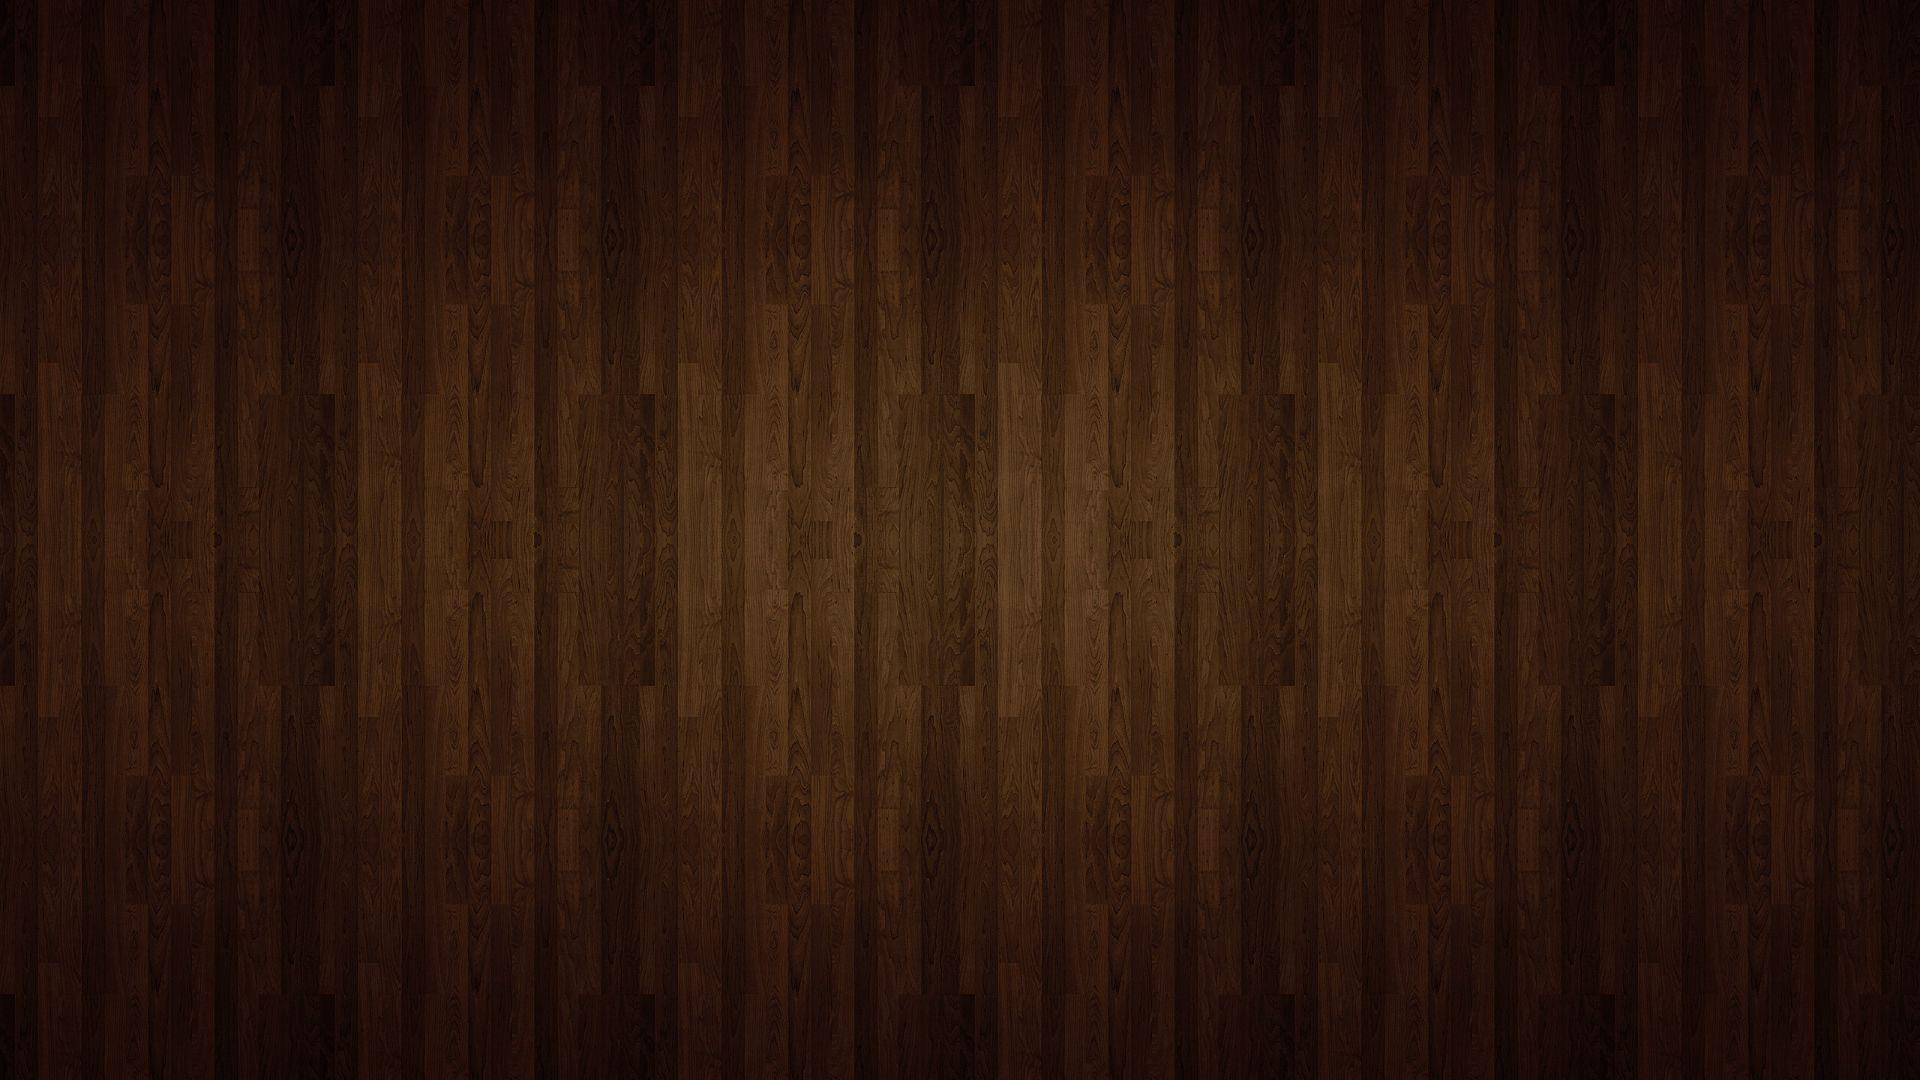 Appealing Designer Black Wood Grain Textured Flap Wallet Woodgrain